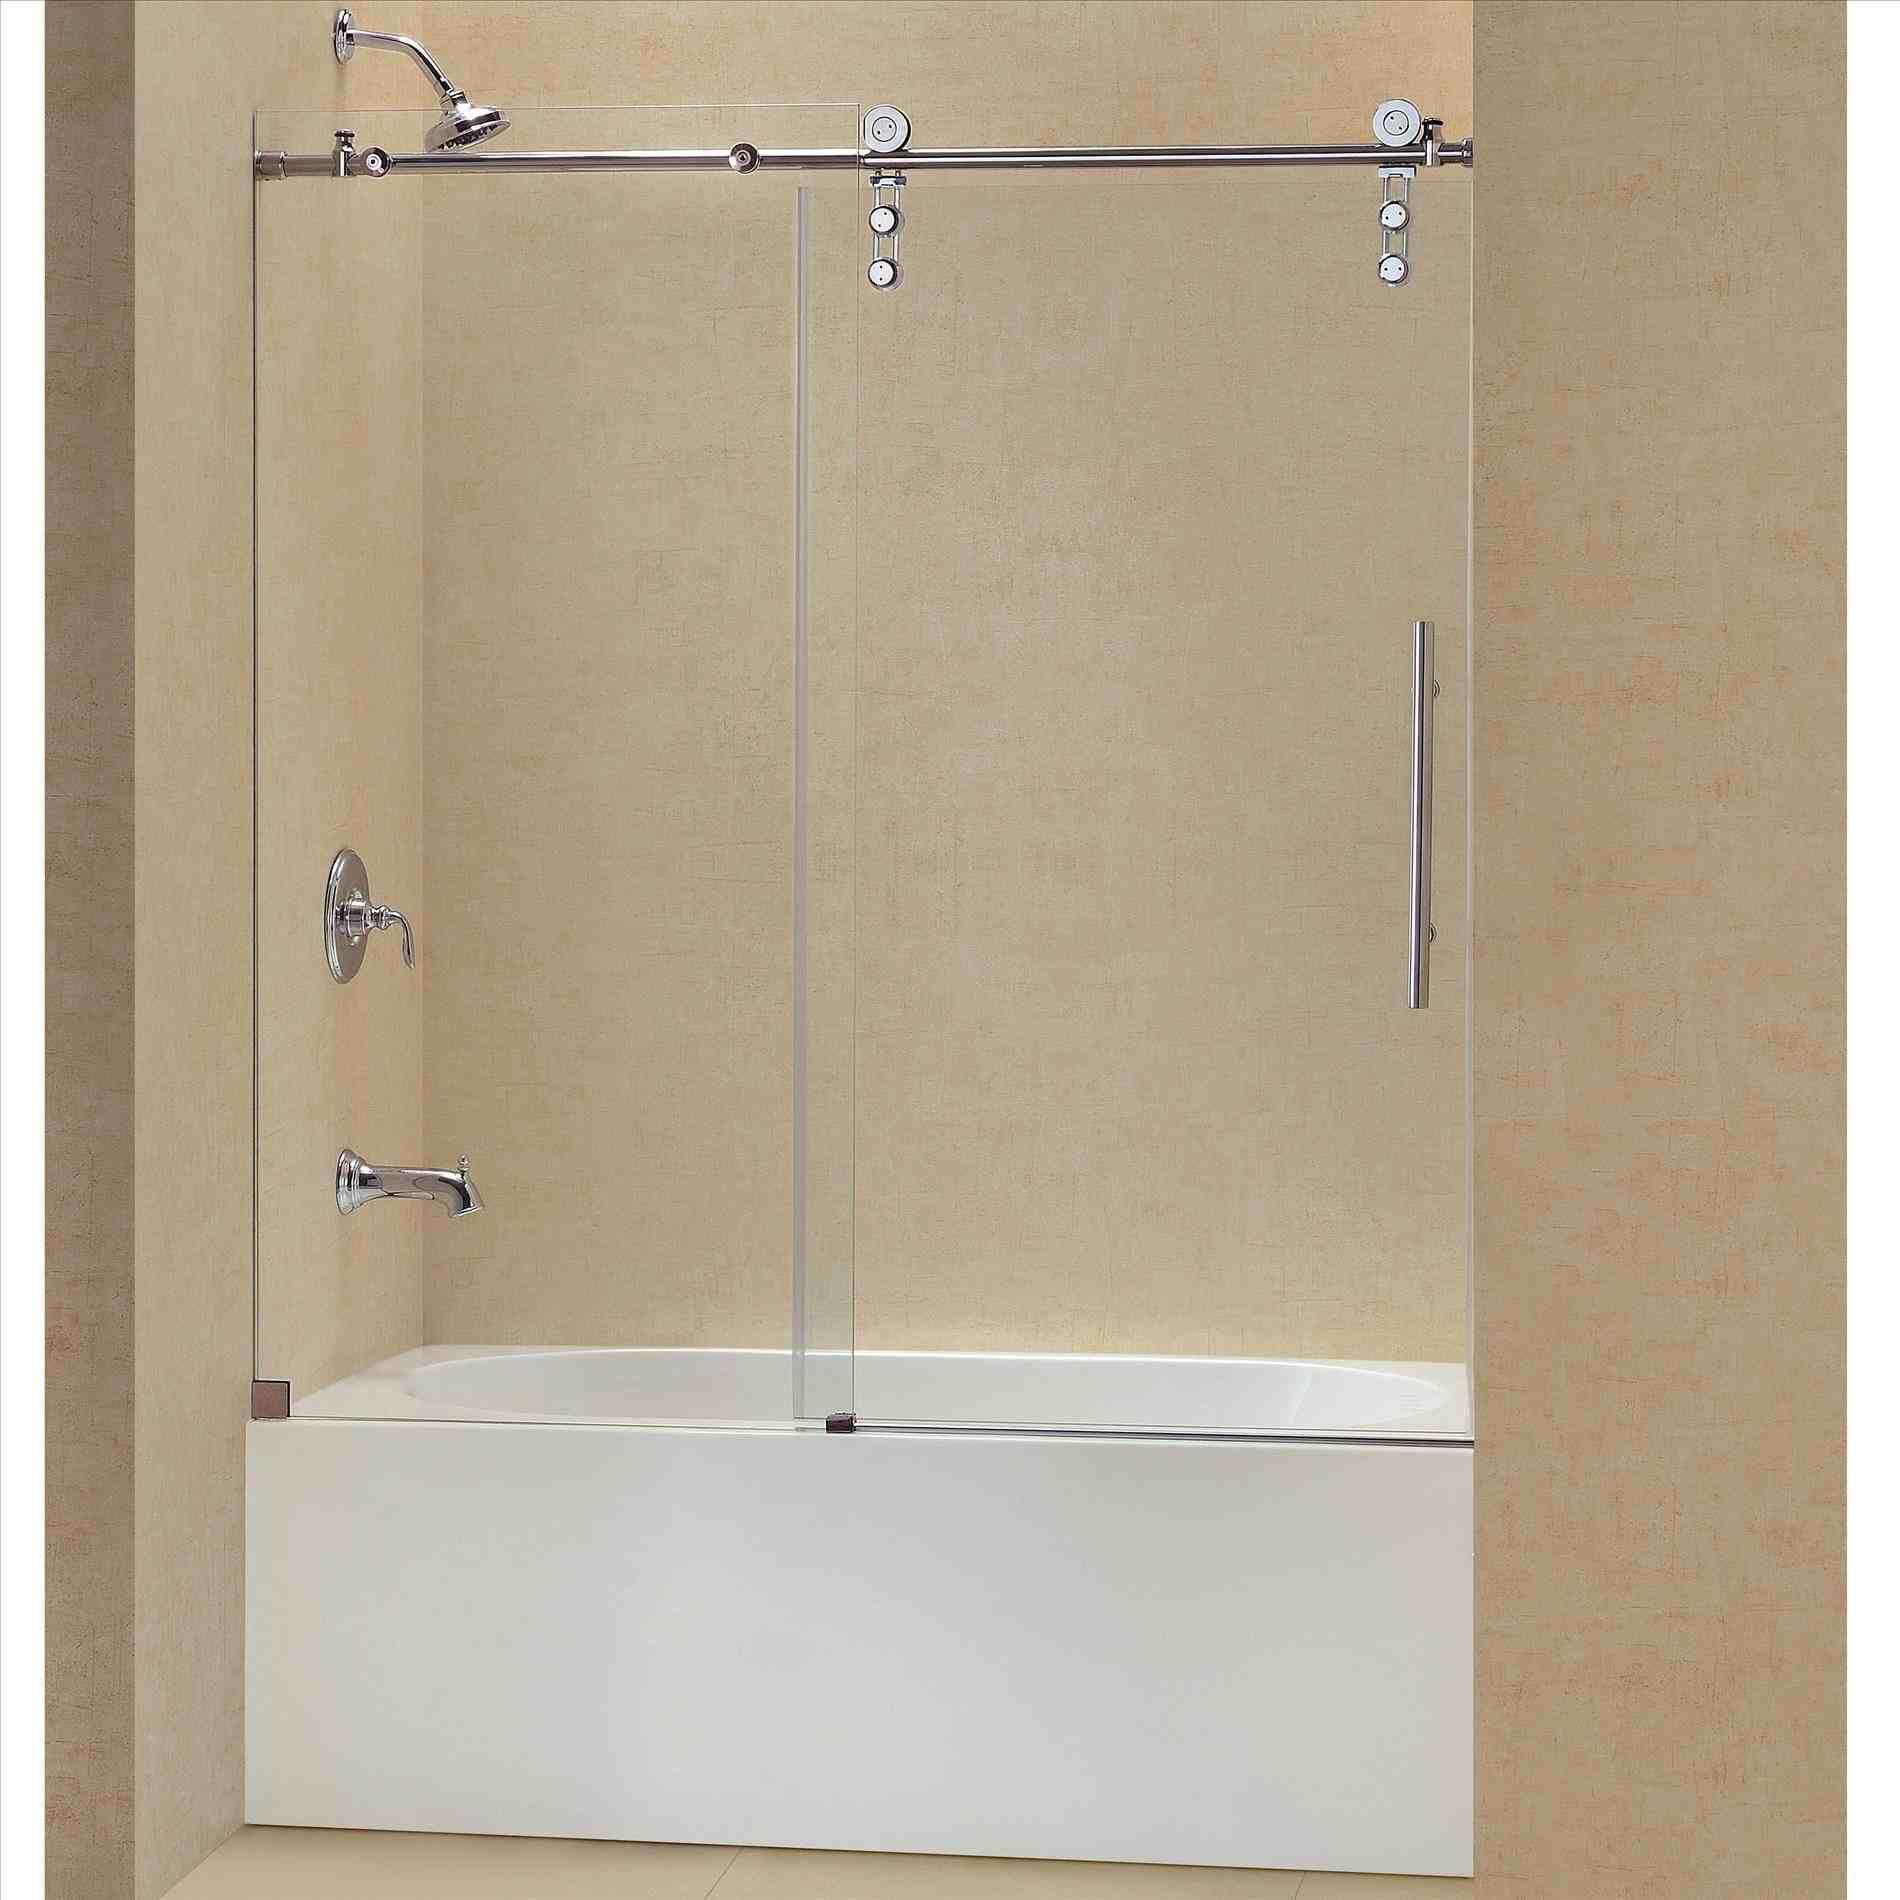 This bathroom tubs with glass doors - bathroom bathtubs style ...